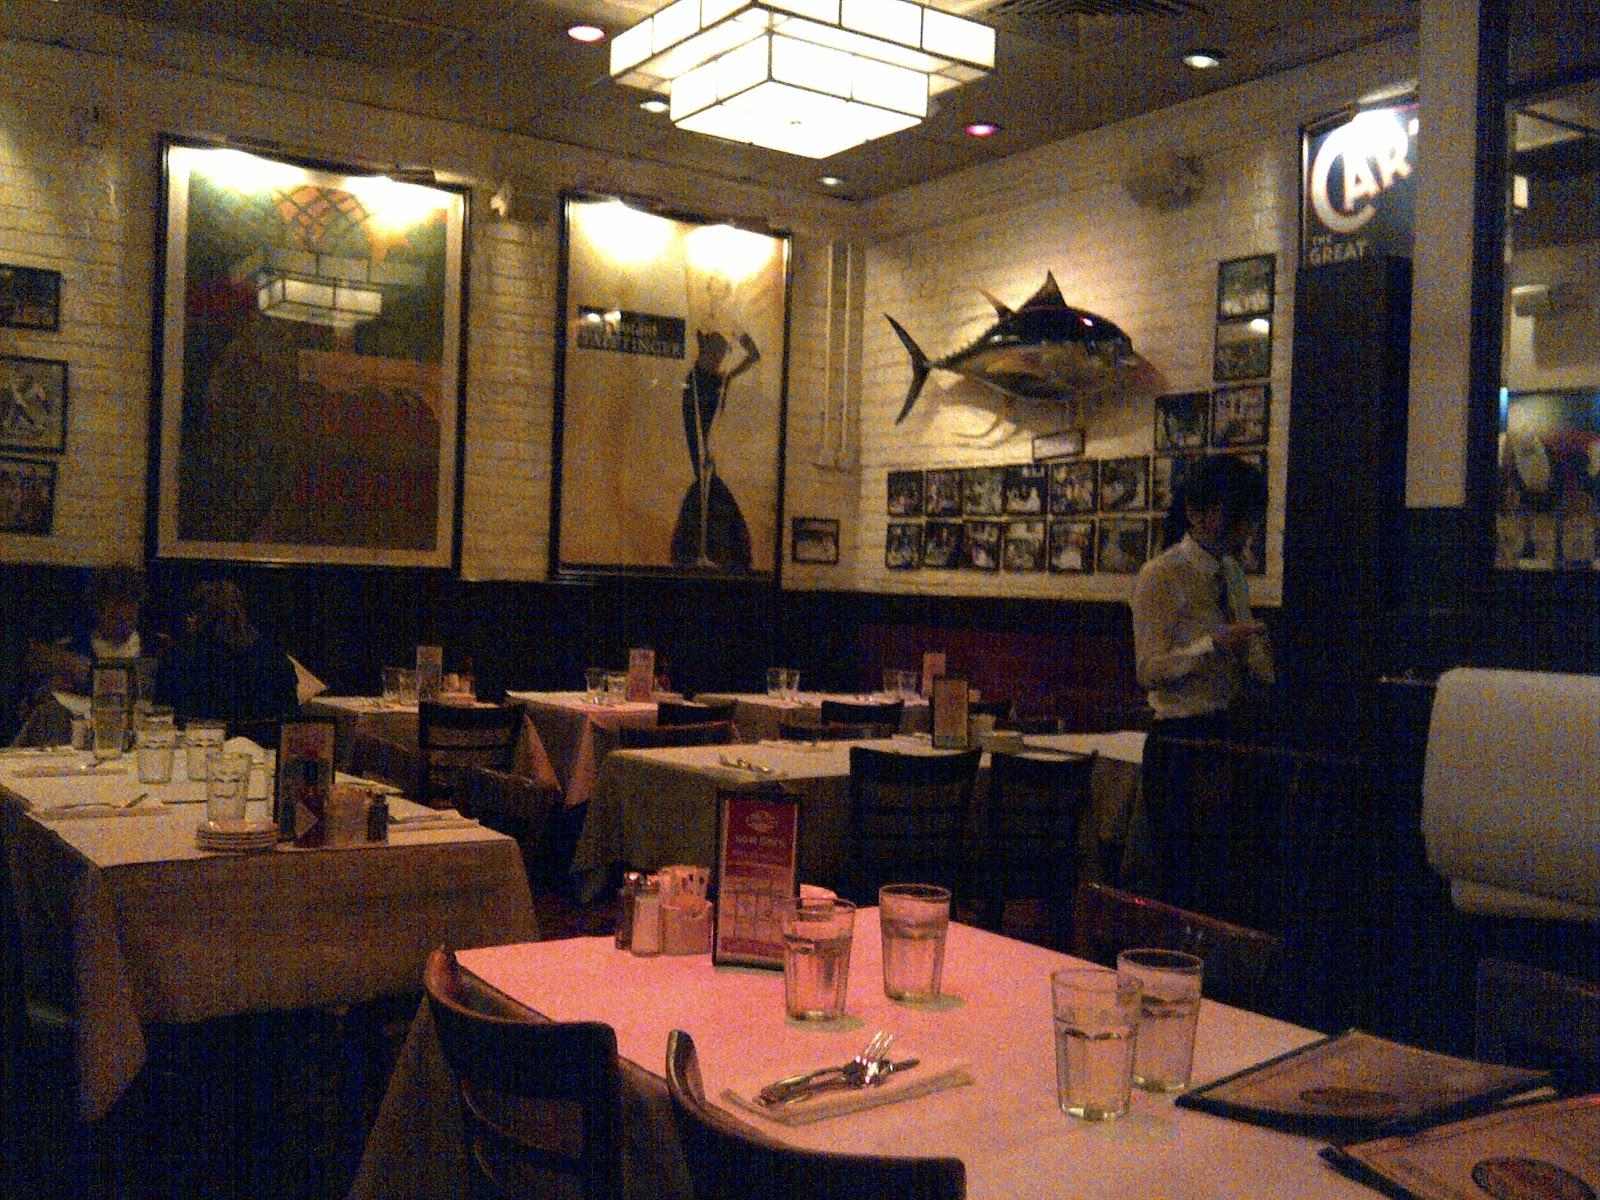 Interiors Were Quite Interesting, With Plenty Of Memorabilia Adorning The  Walls, The Restaurant Motif Being Chicago Restaurant Cum Sports Bar.